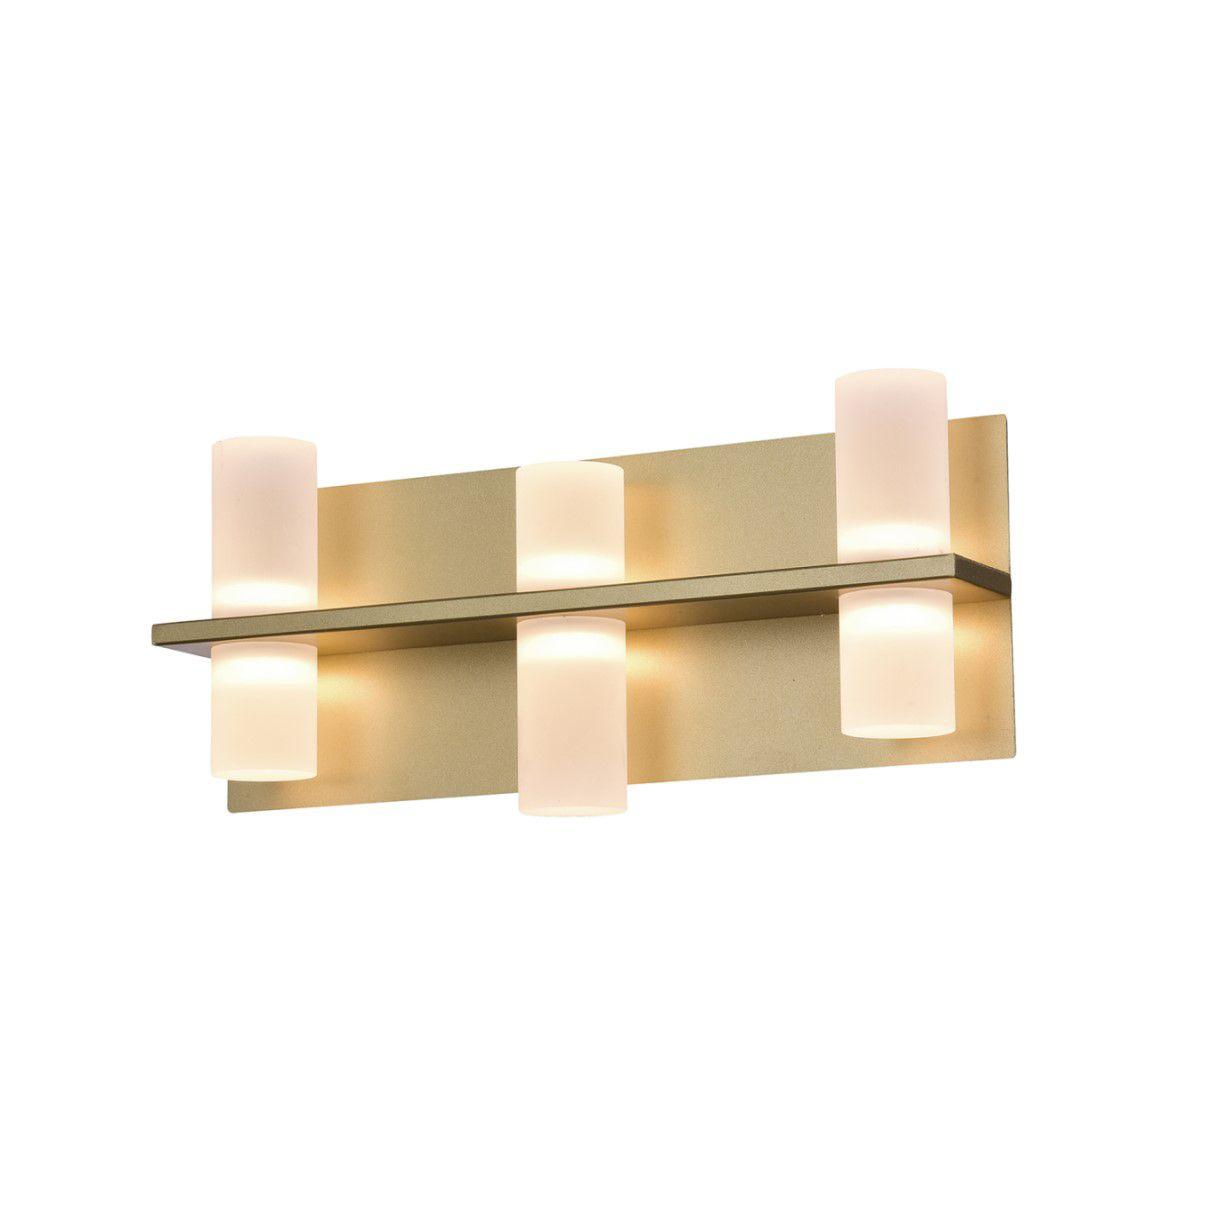 Arandela LED Bella JJ012 Clair 24W 2700K Bivolt 90x365x155mm Sand Gold Fosco